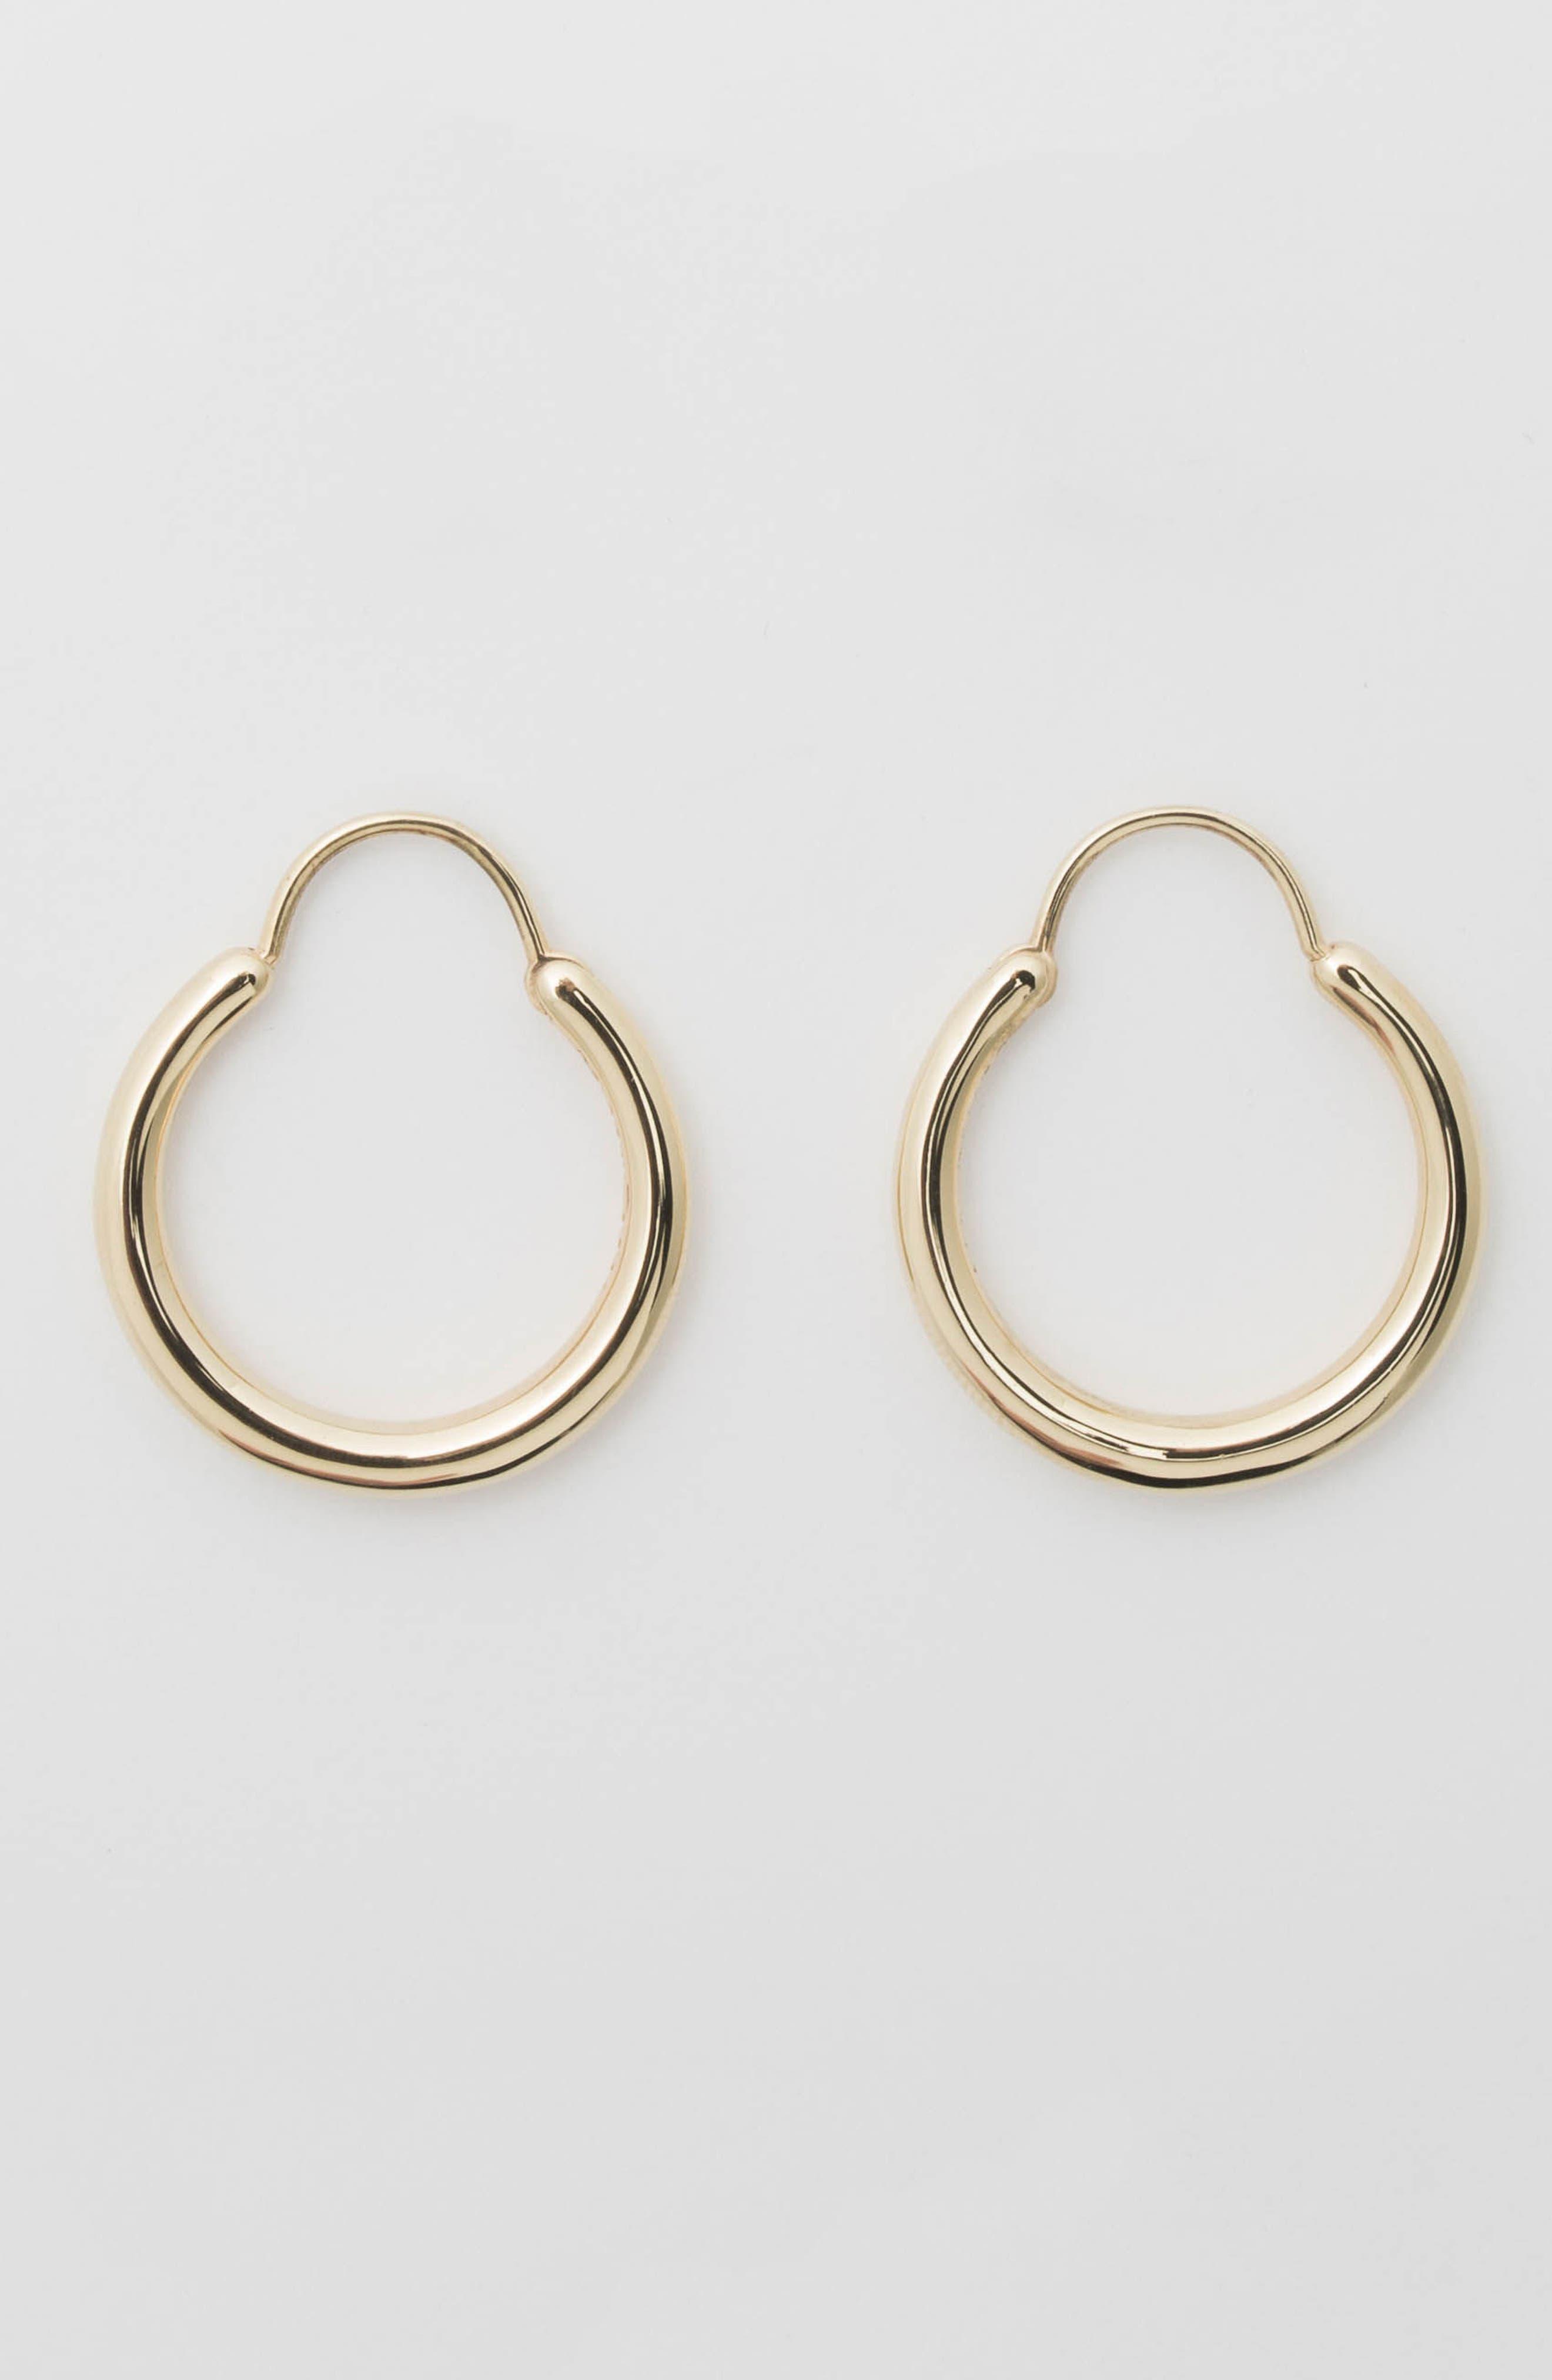 Small Snake Polished Vermeil Earrings,                             Alternate thumbnail 5, color,